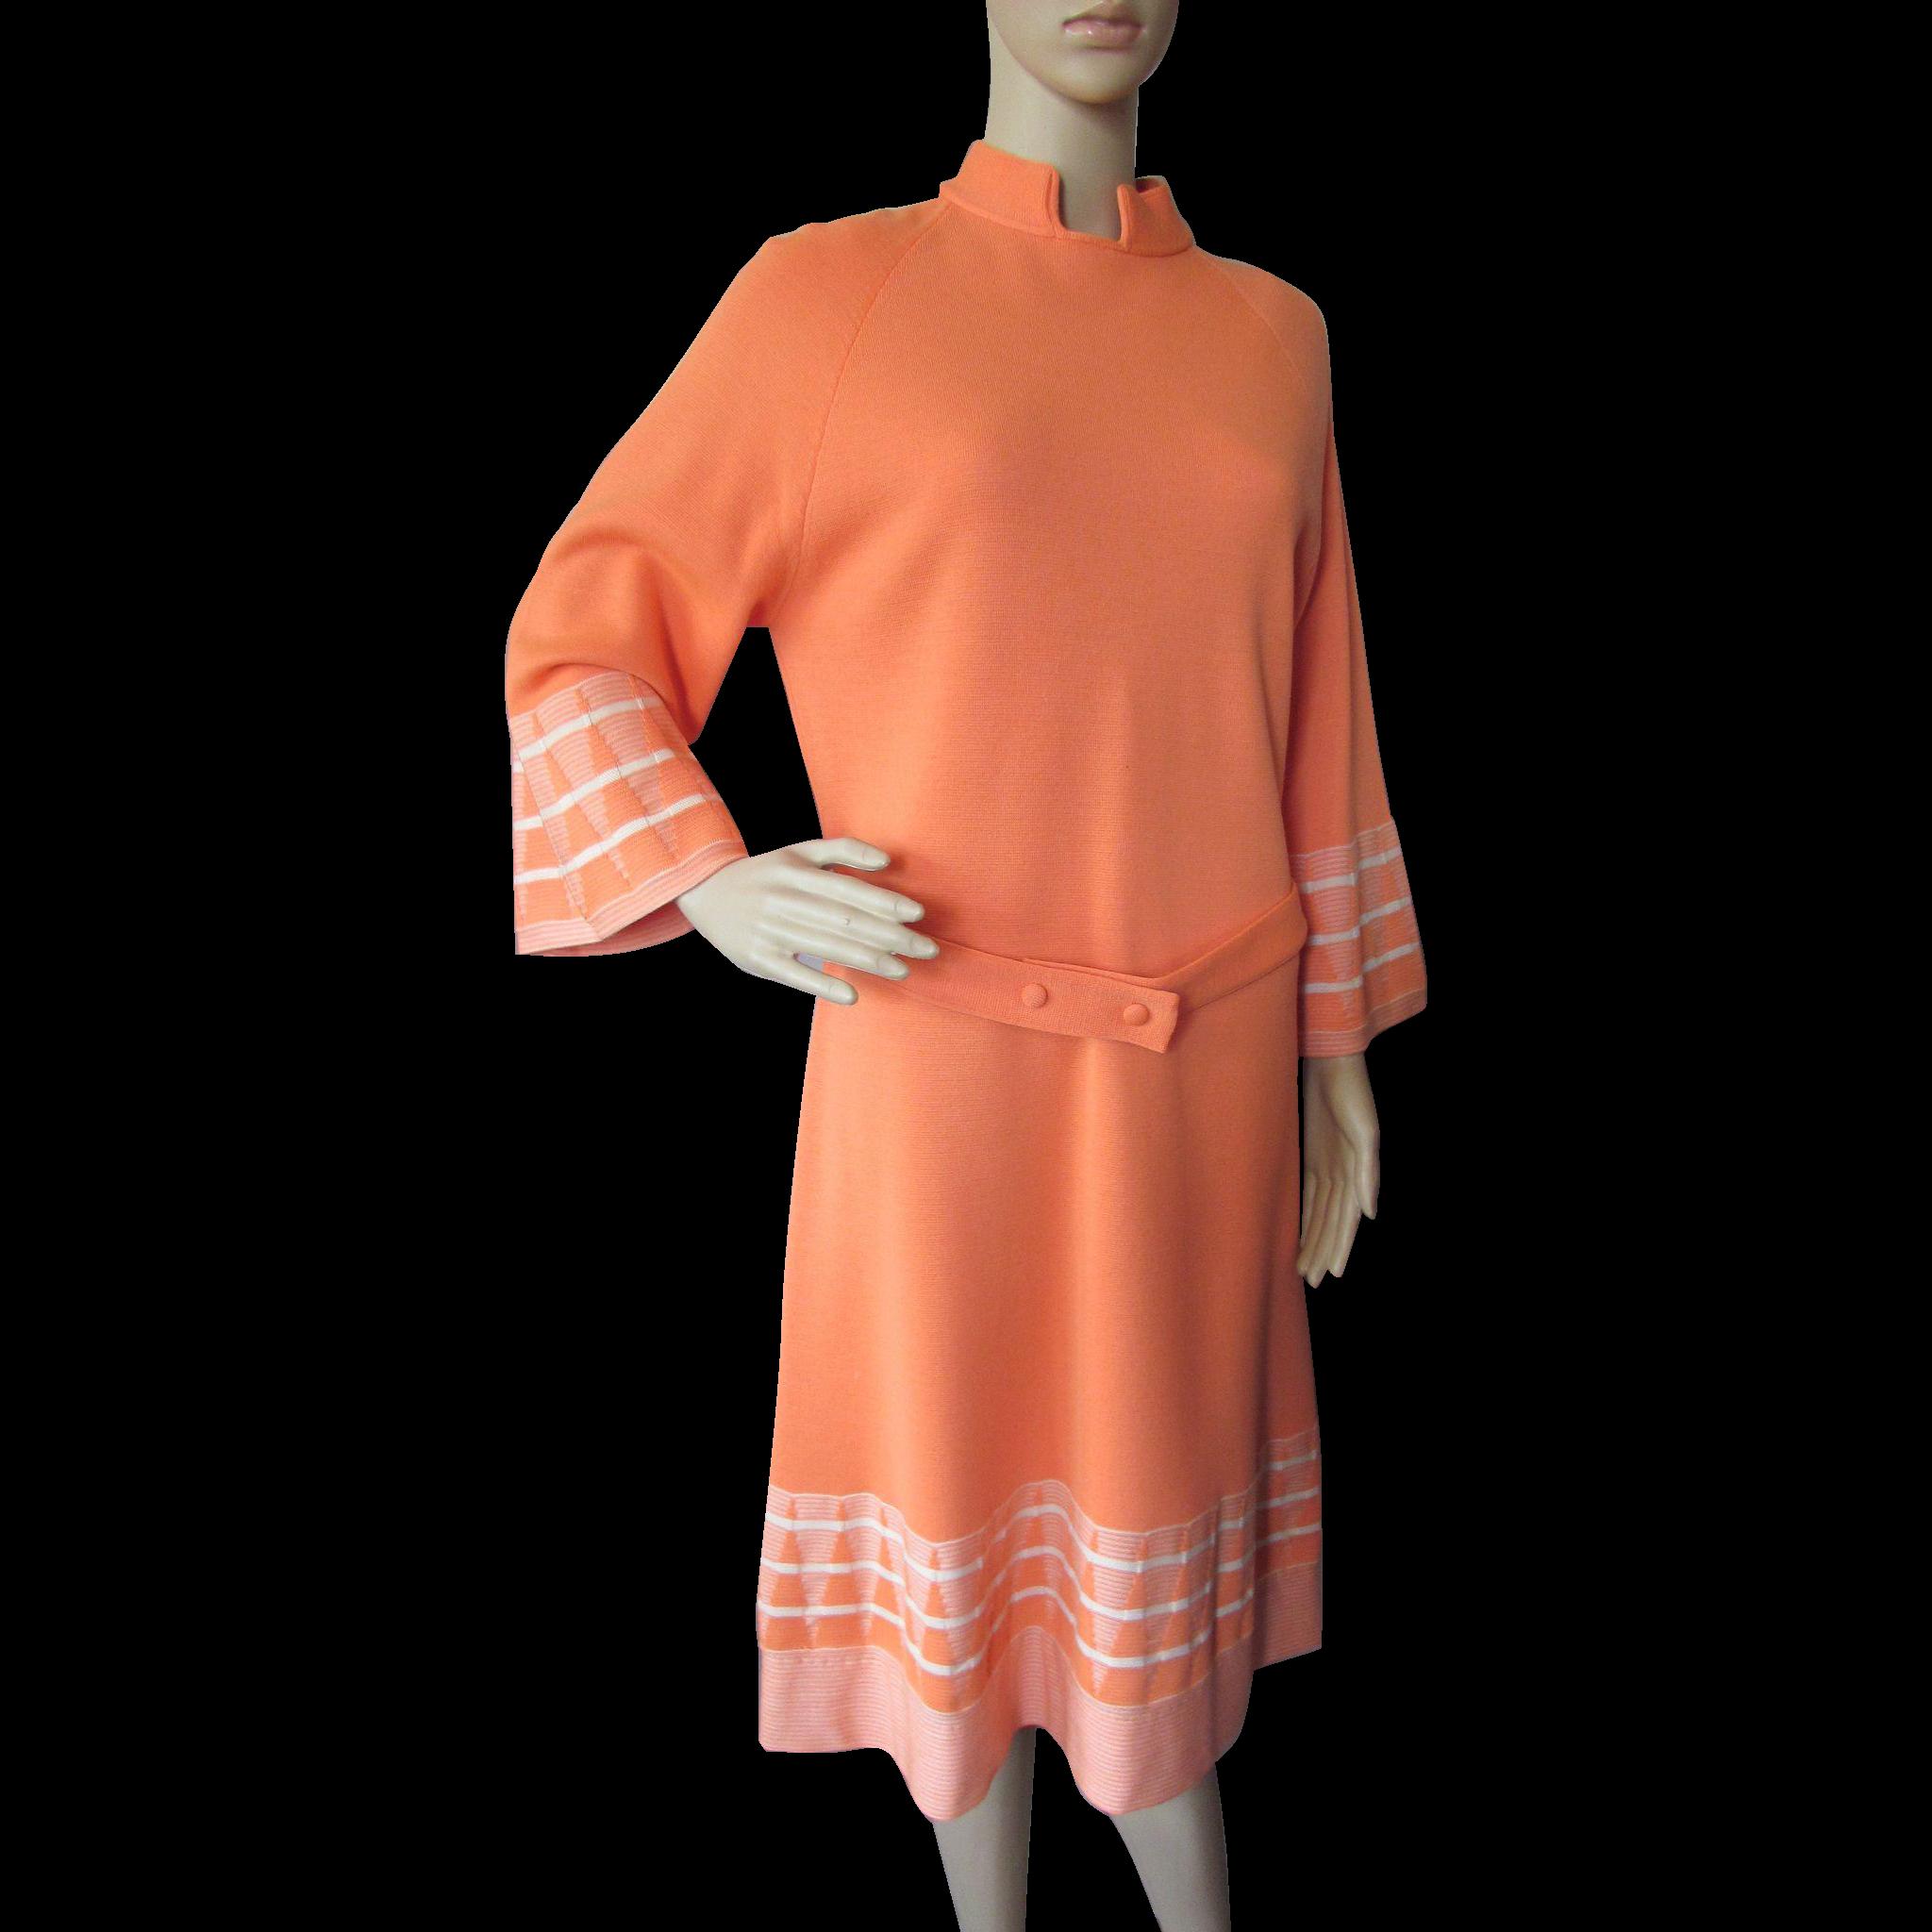 Trendy 1970 Era Dress in Citrus Orange Wool with Flared Sleeves Italy Cadillac Venezia New York